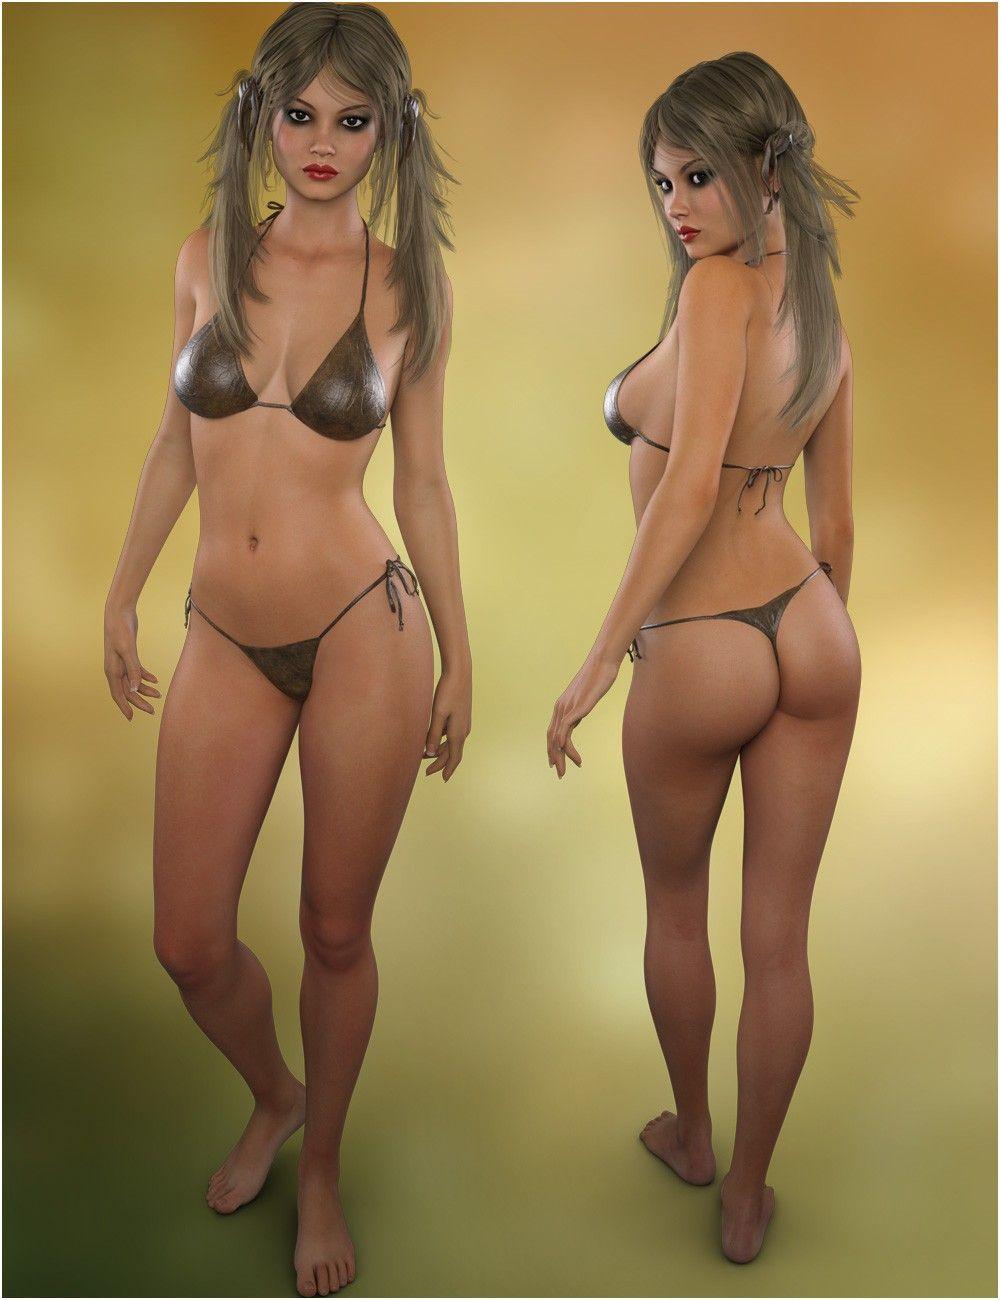 egyptian Queen nude